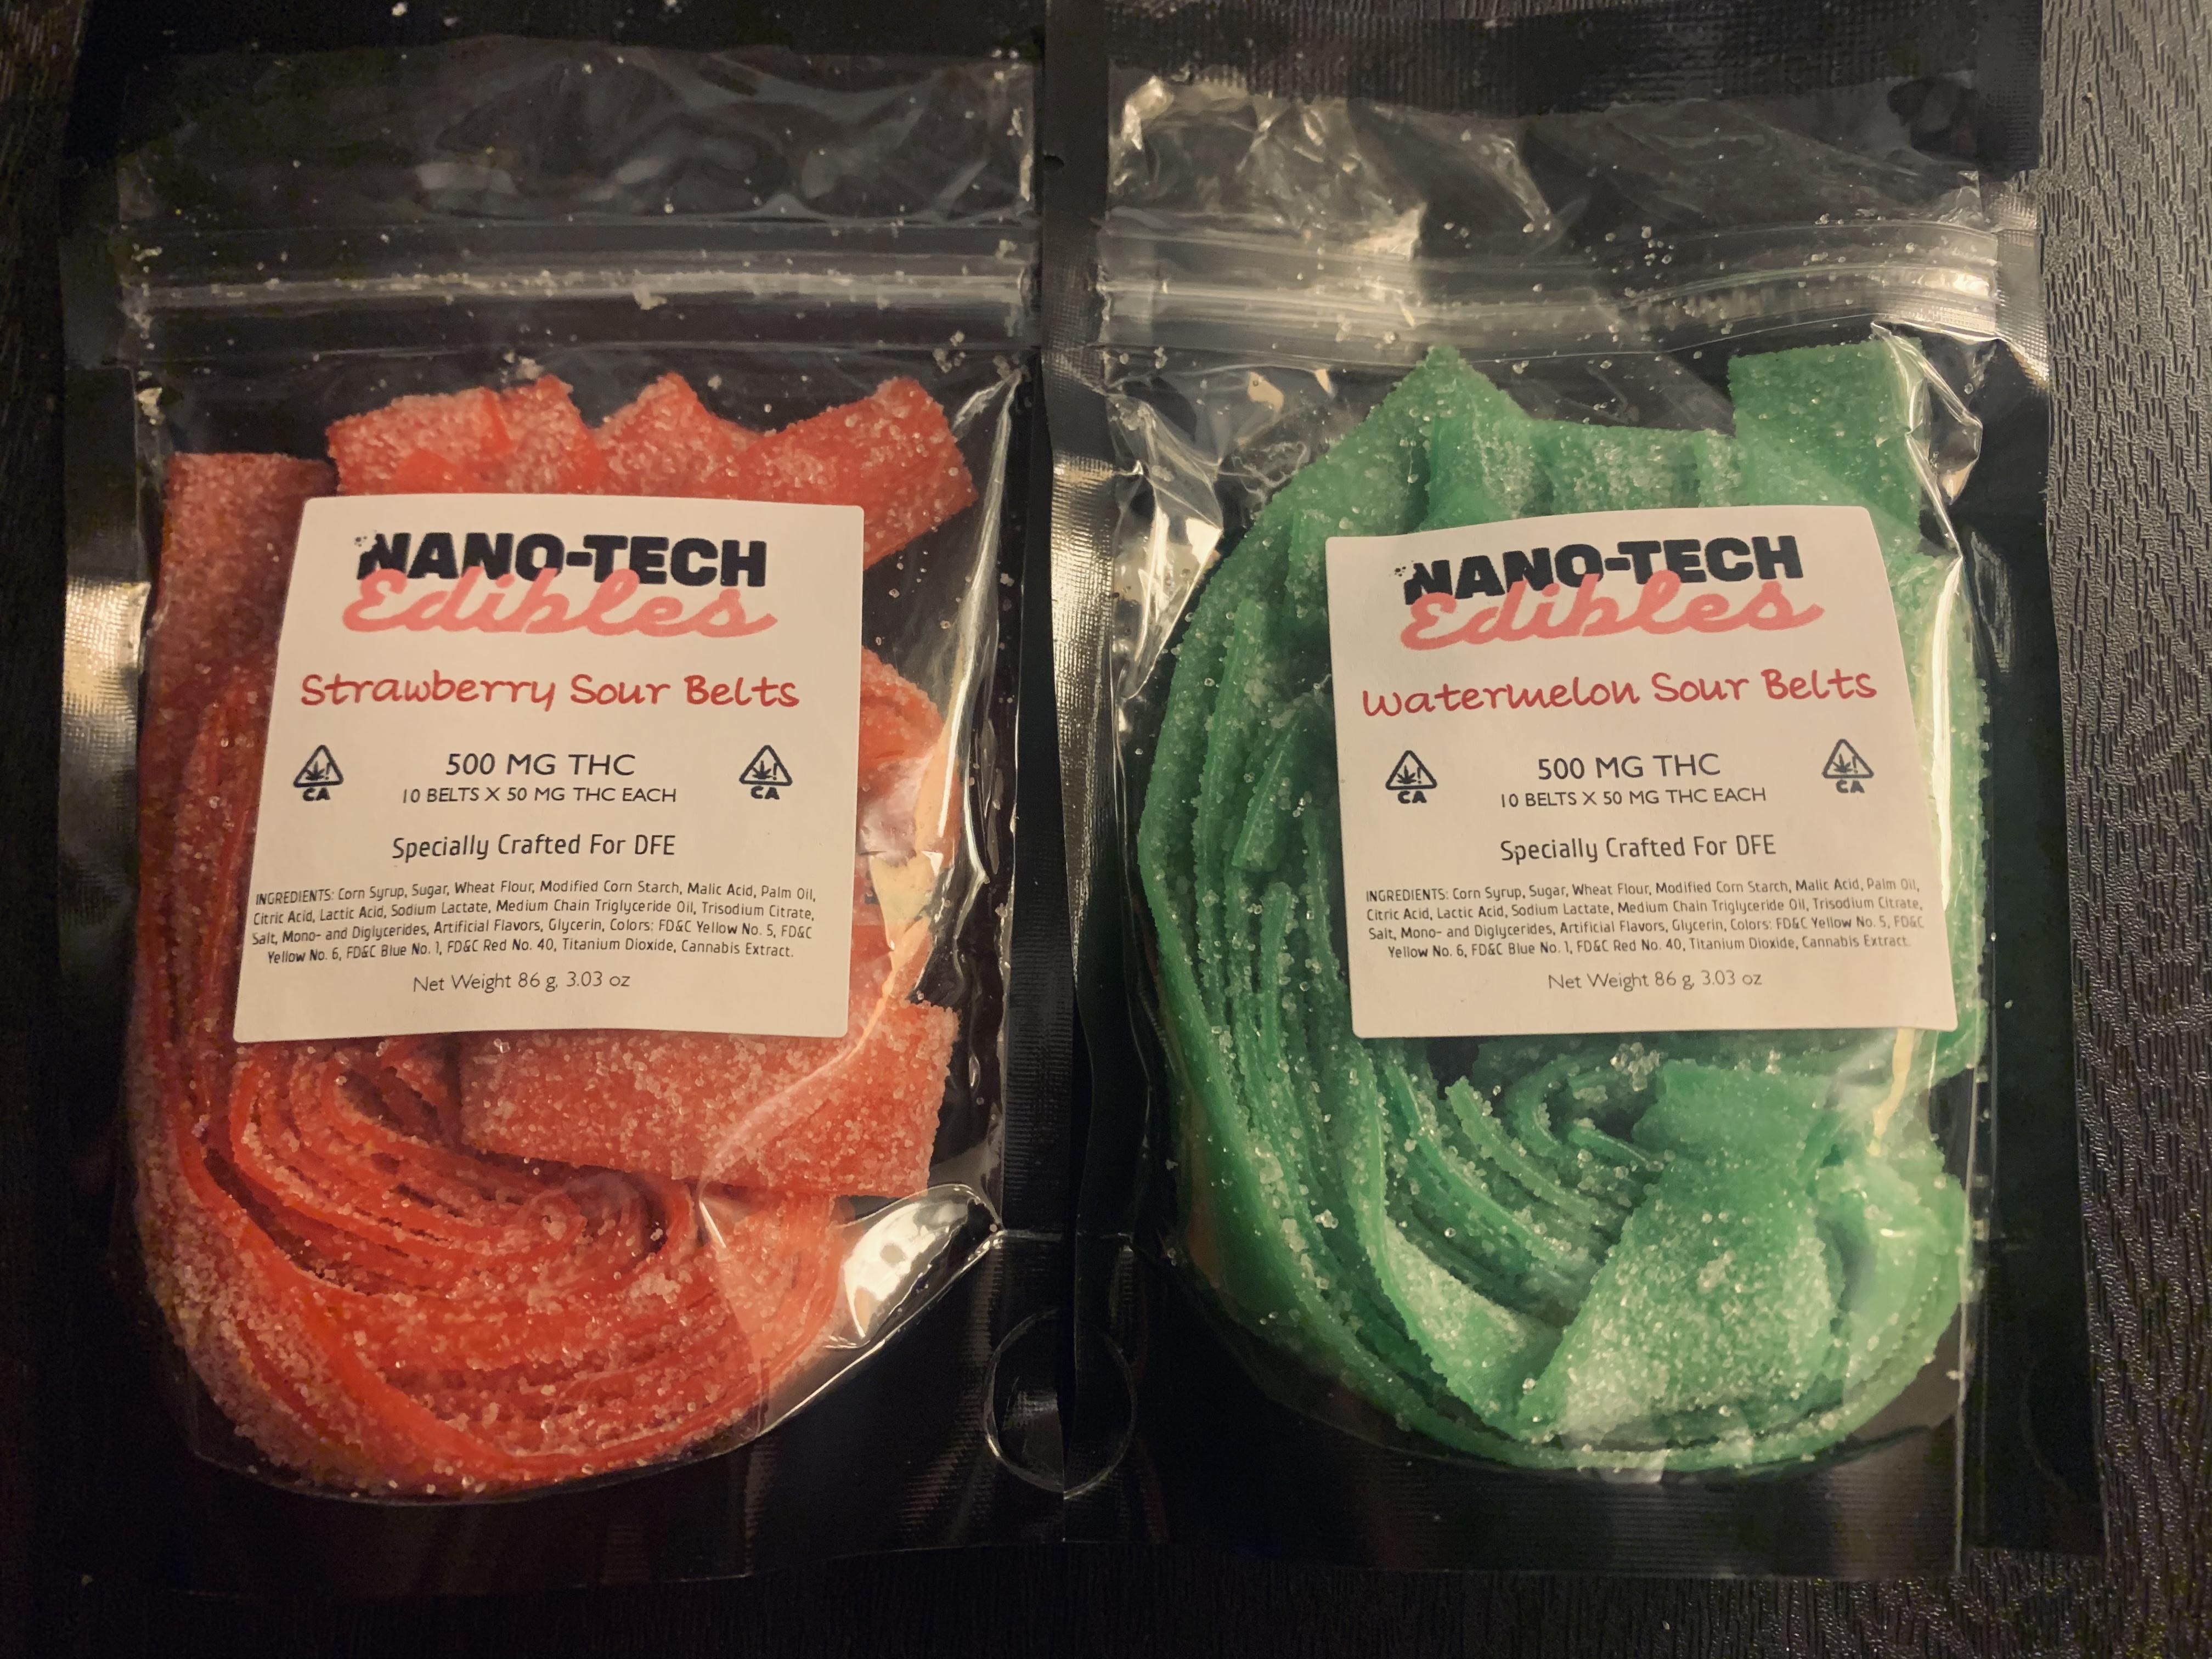 Nanotechnology Edibles: Sour Belts 500mg